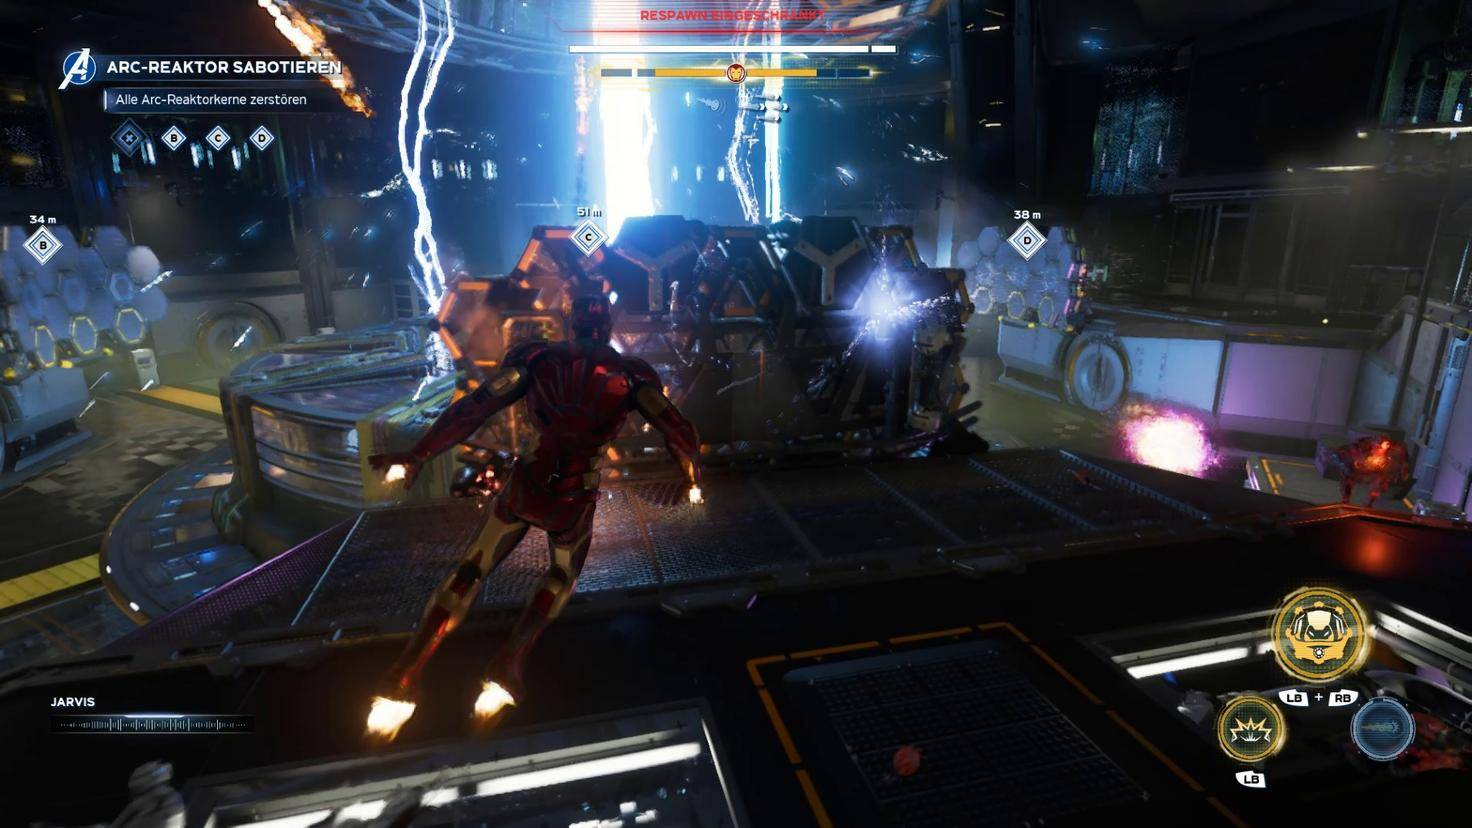 marvels-avengers-iron-man-screenshot